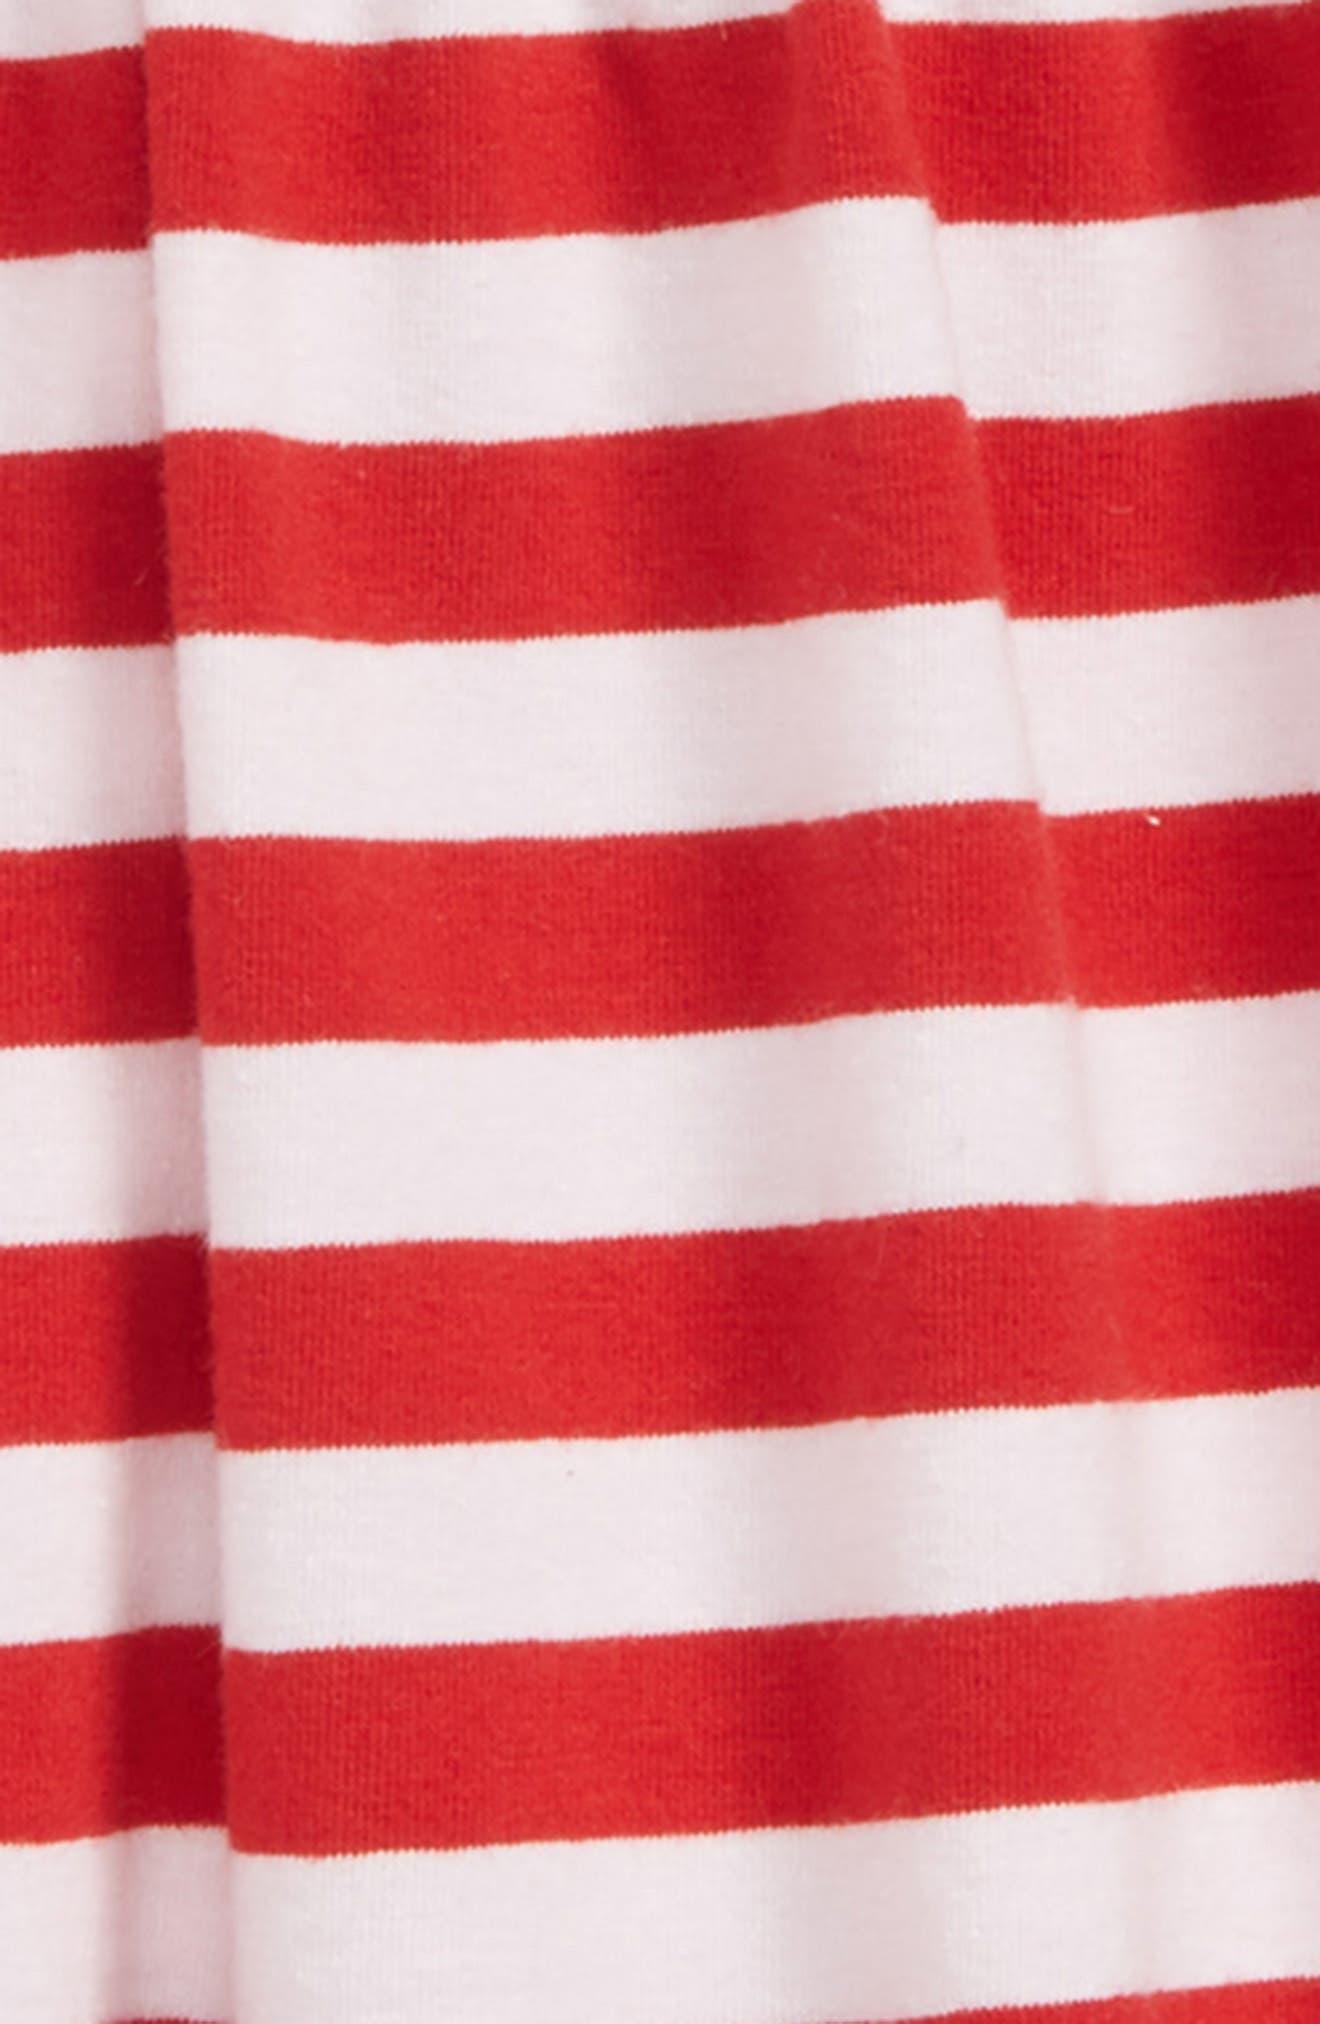 Easy Knit Stripe Dress,                             Alternate thumbnail 2, color,                             Red Samba- White Stripe